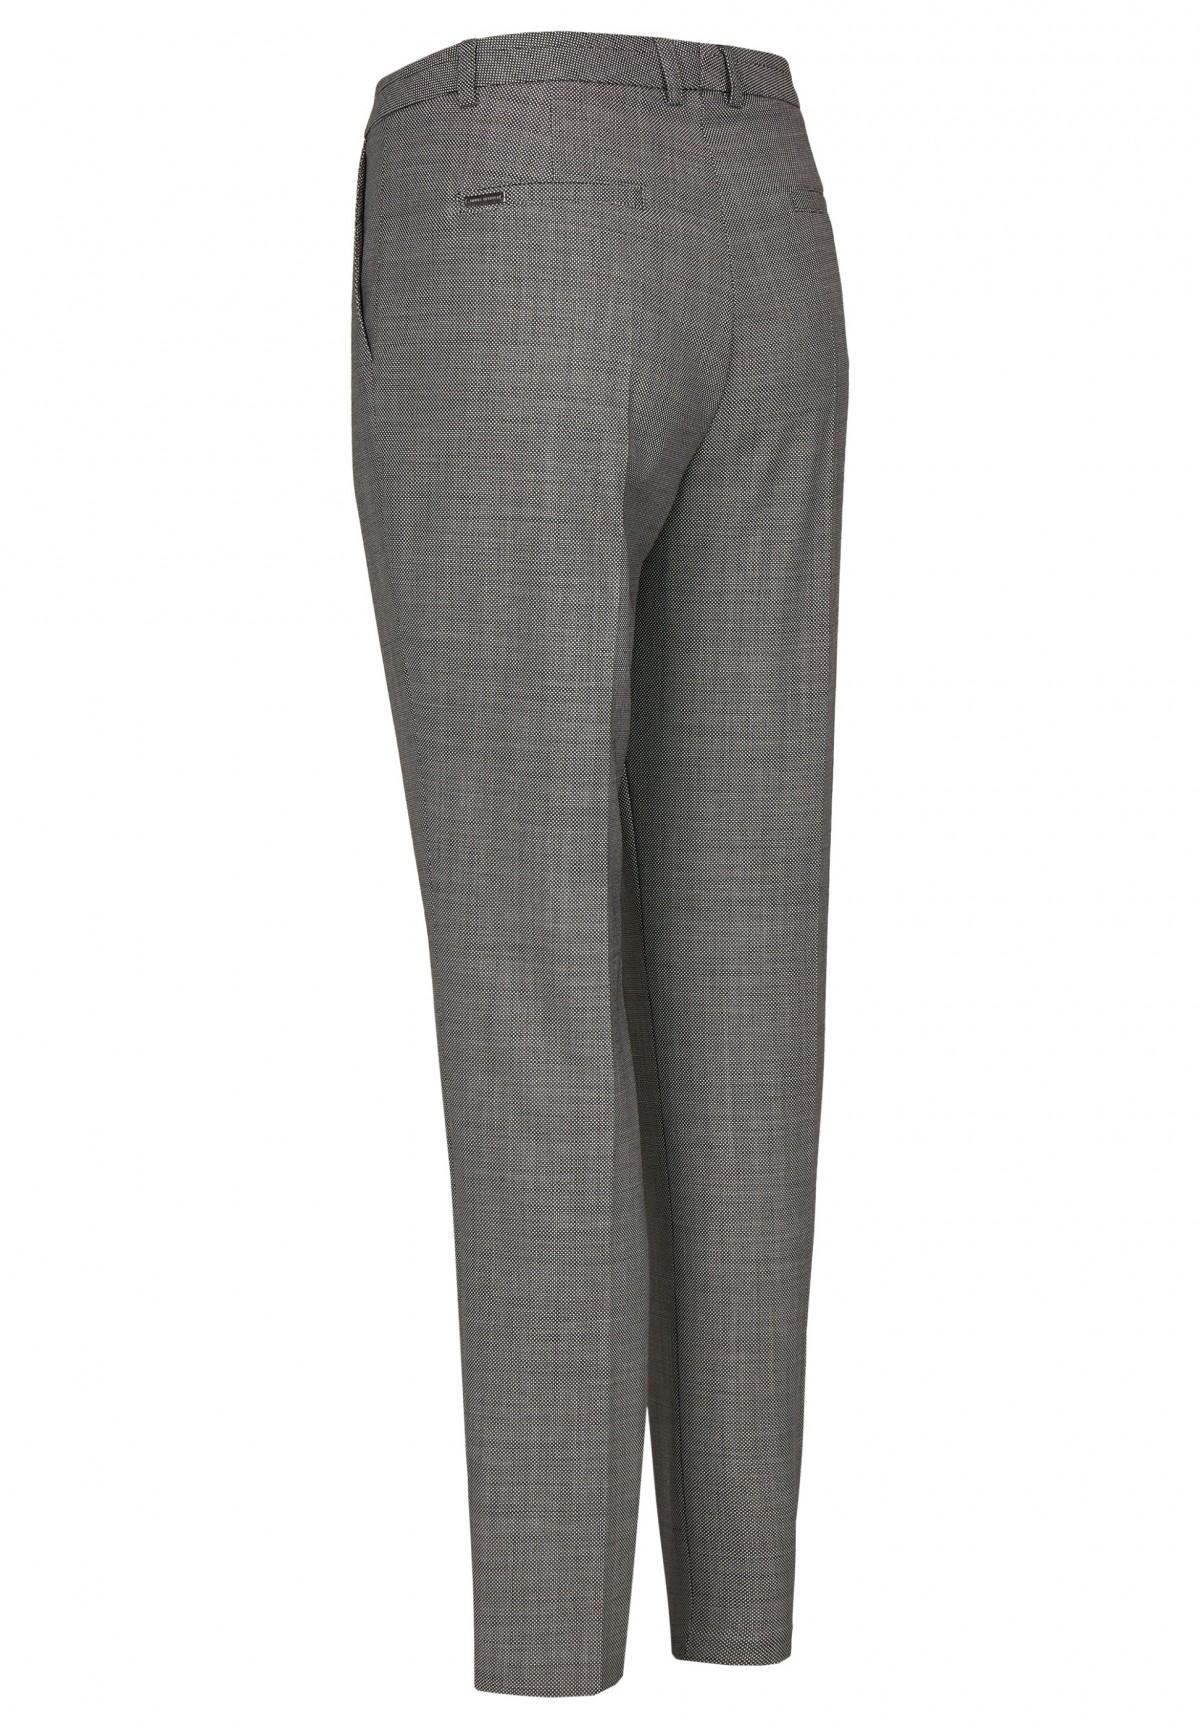 Klassische Hose / Elegante Woll-Hose